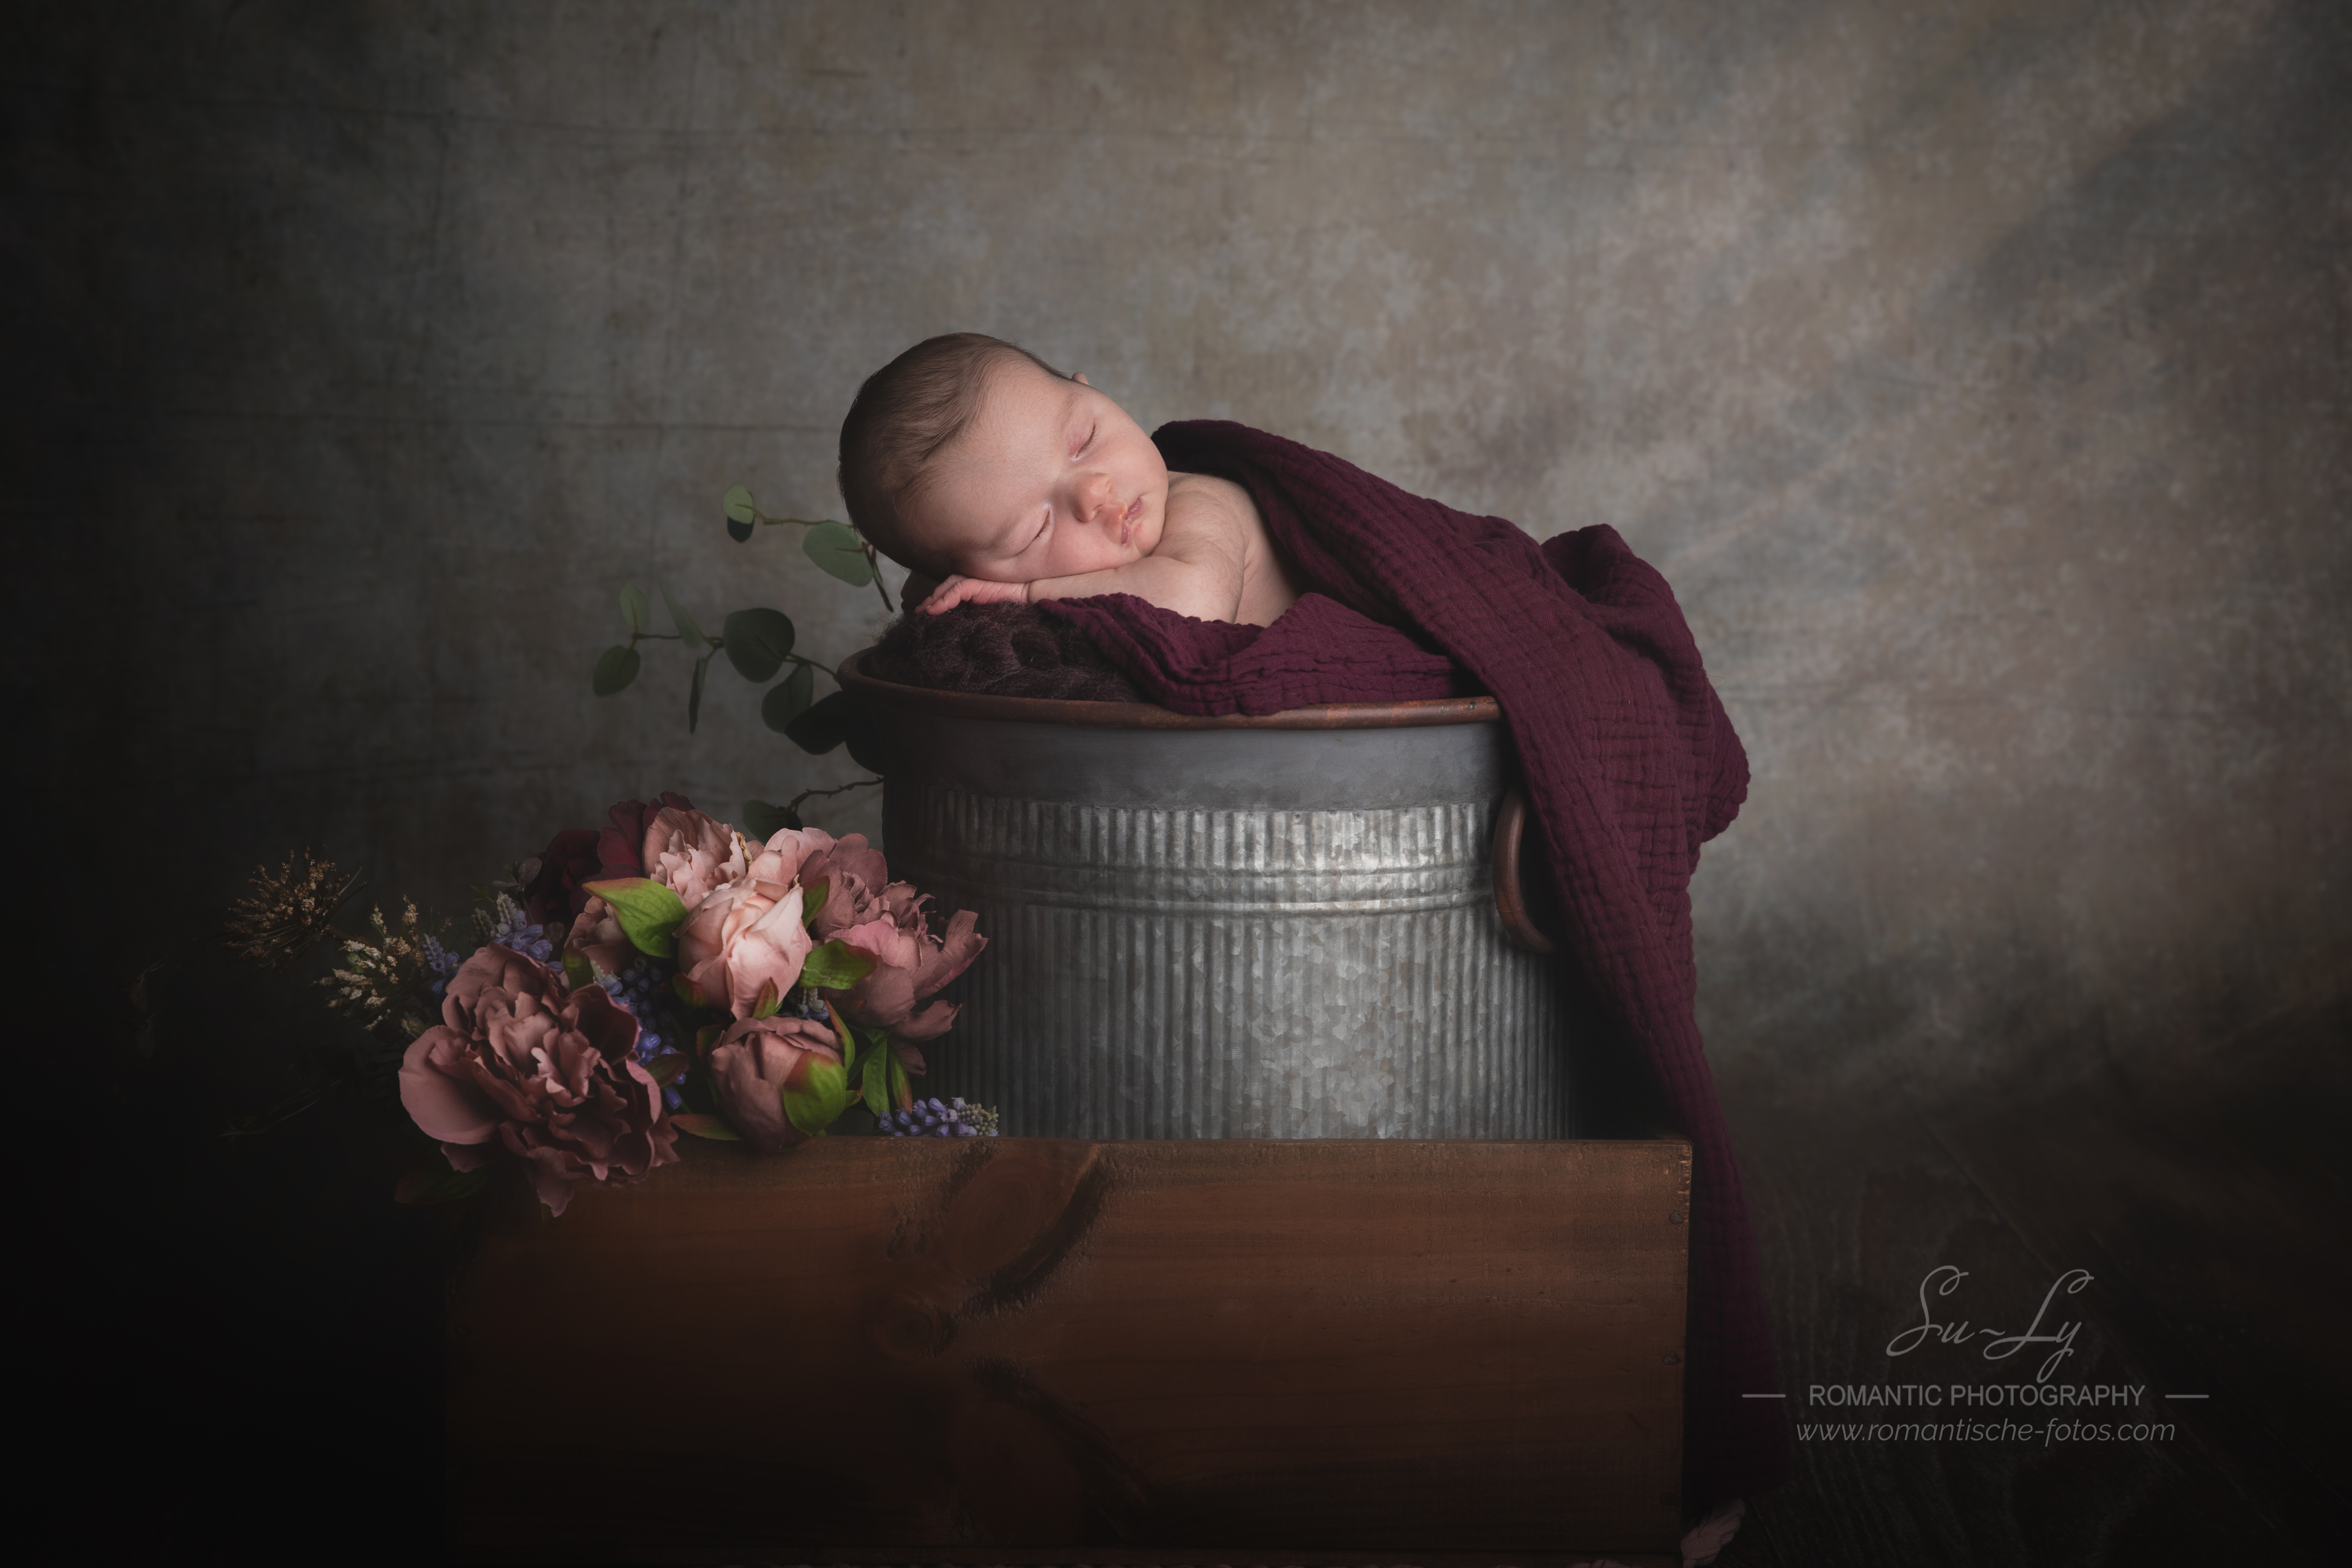 Su-Ly ROMANTIC-PHOTOGRAPHY--13